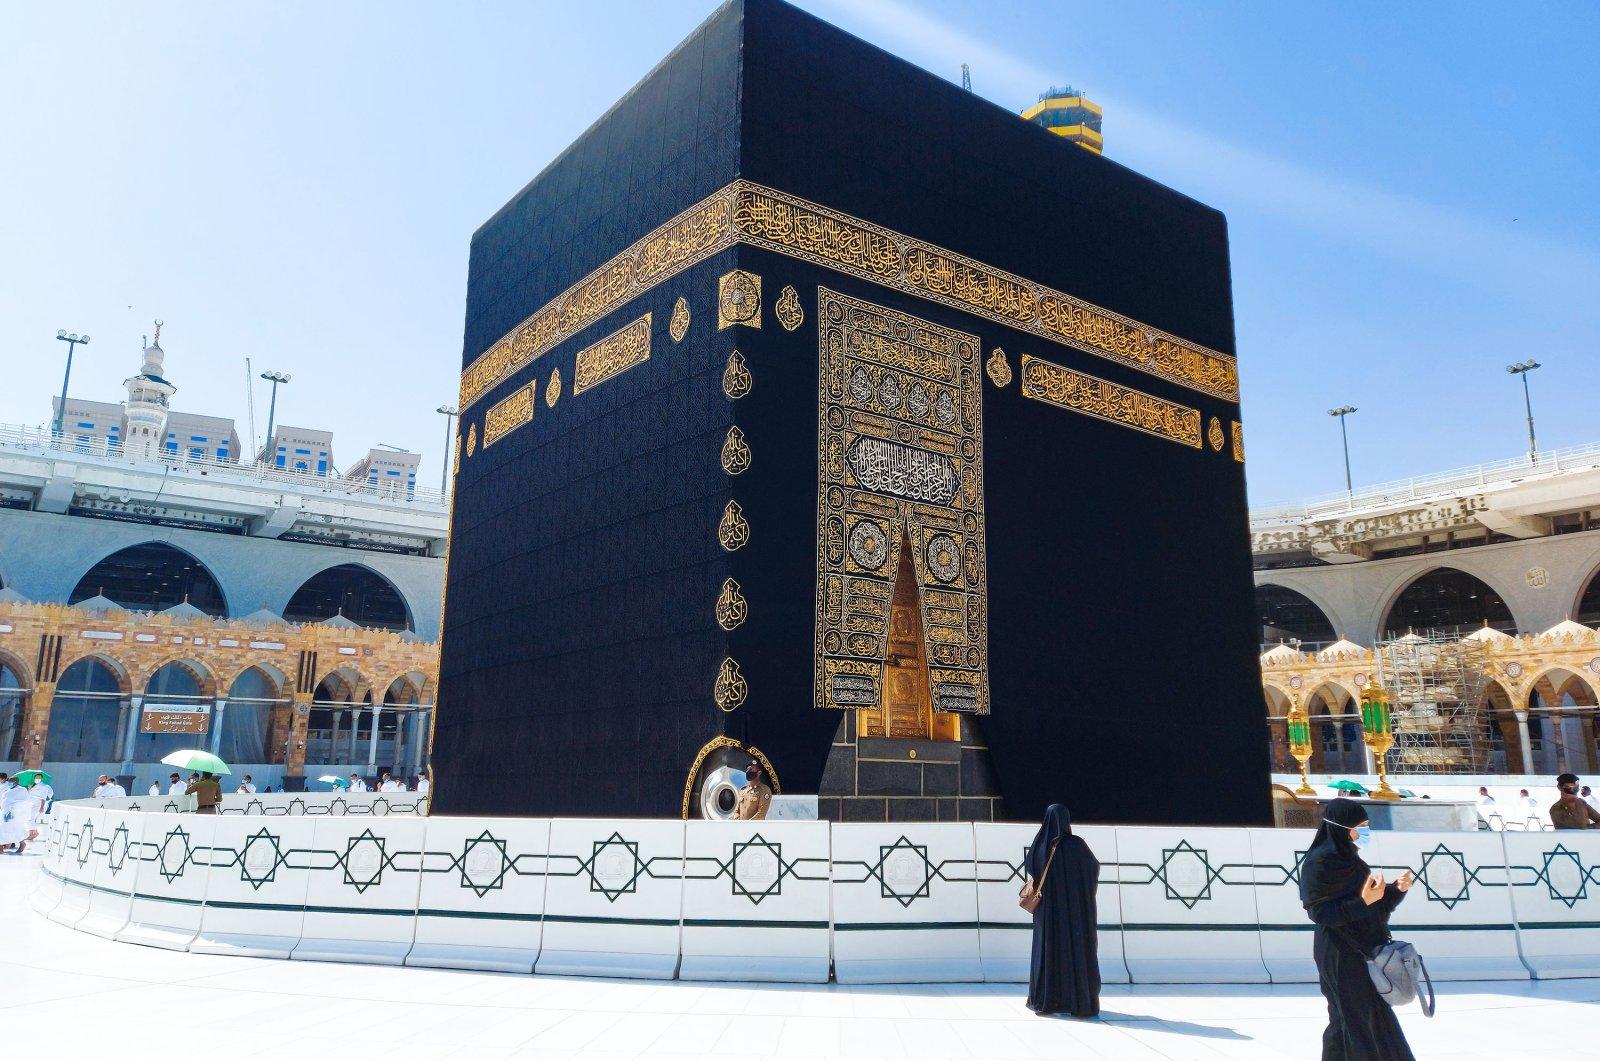 Pilgrims circle the Kaaba, the holiest site in Islam, at Masjid al-Haram in Mecca, Saudi Arabia, Oct. 22, 2020. (Shutterstock Photo)